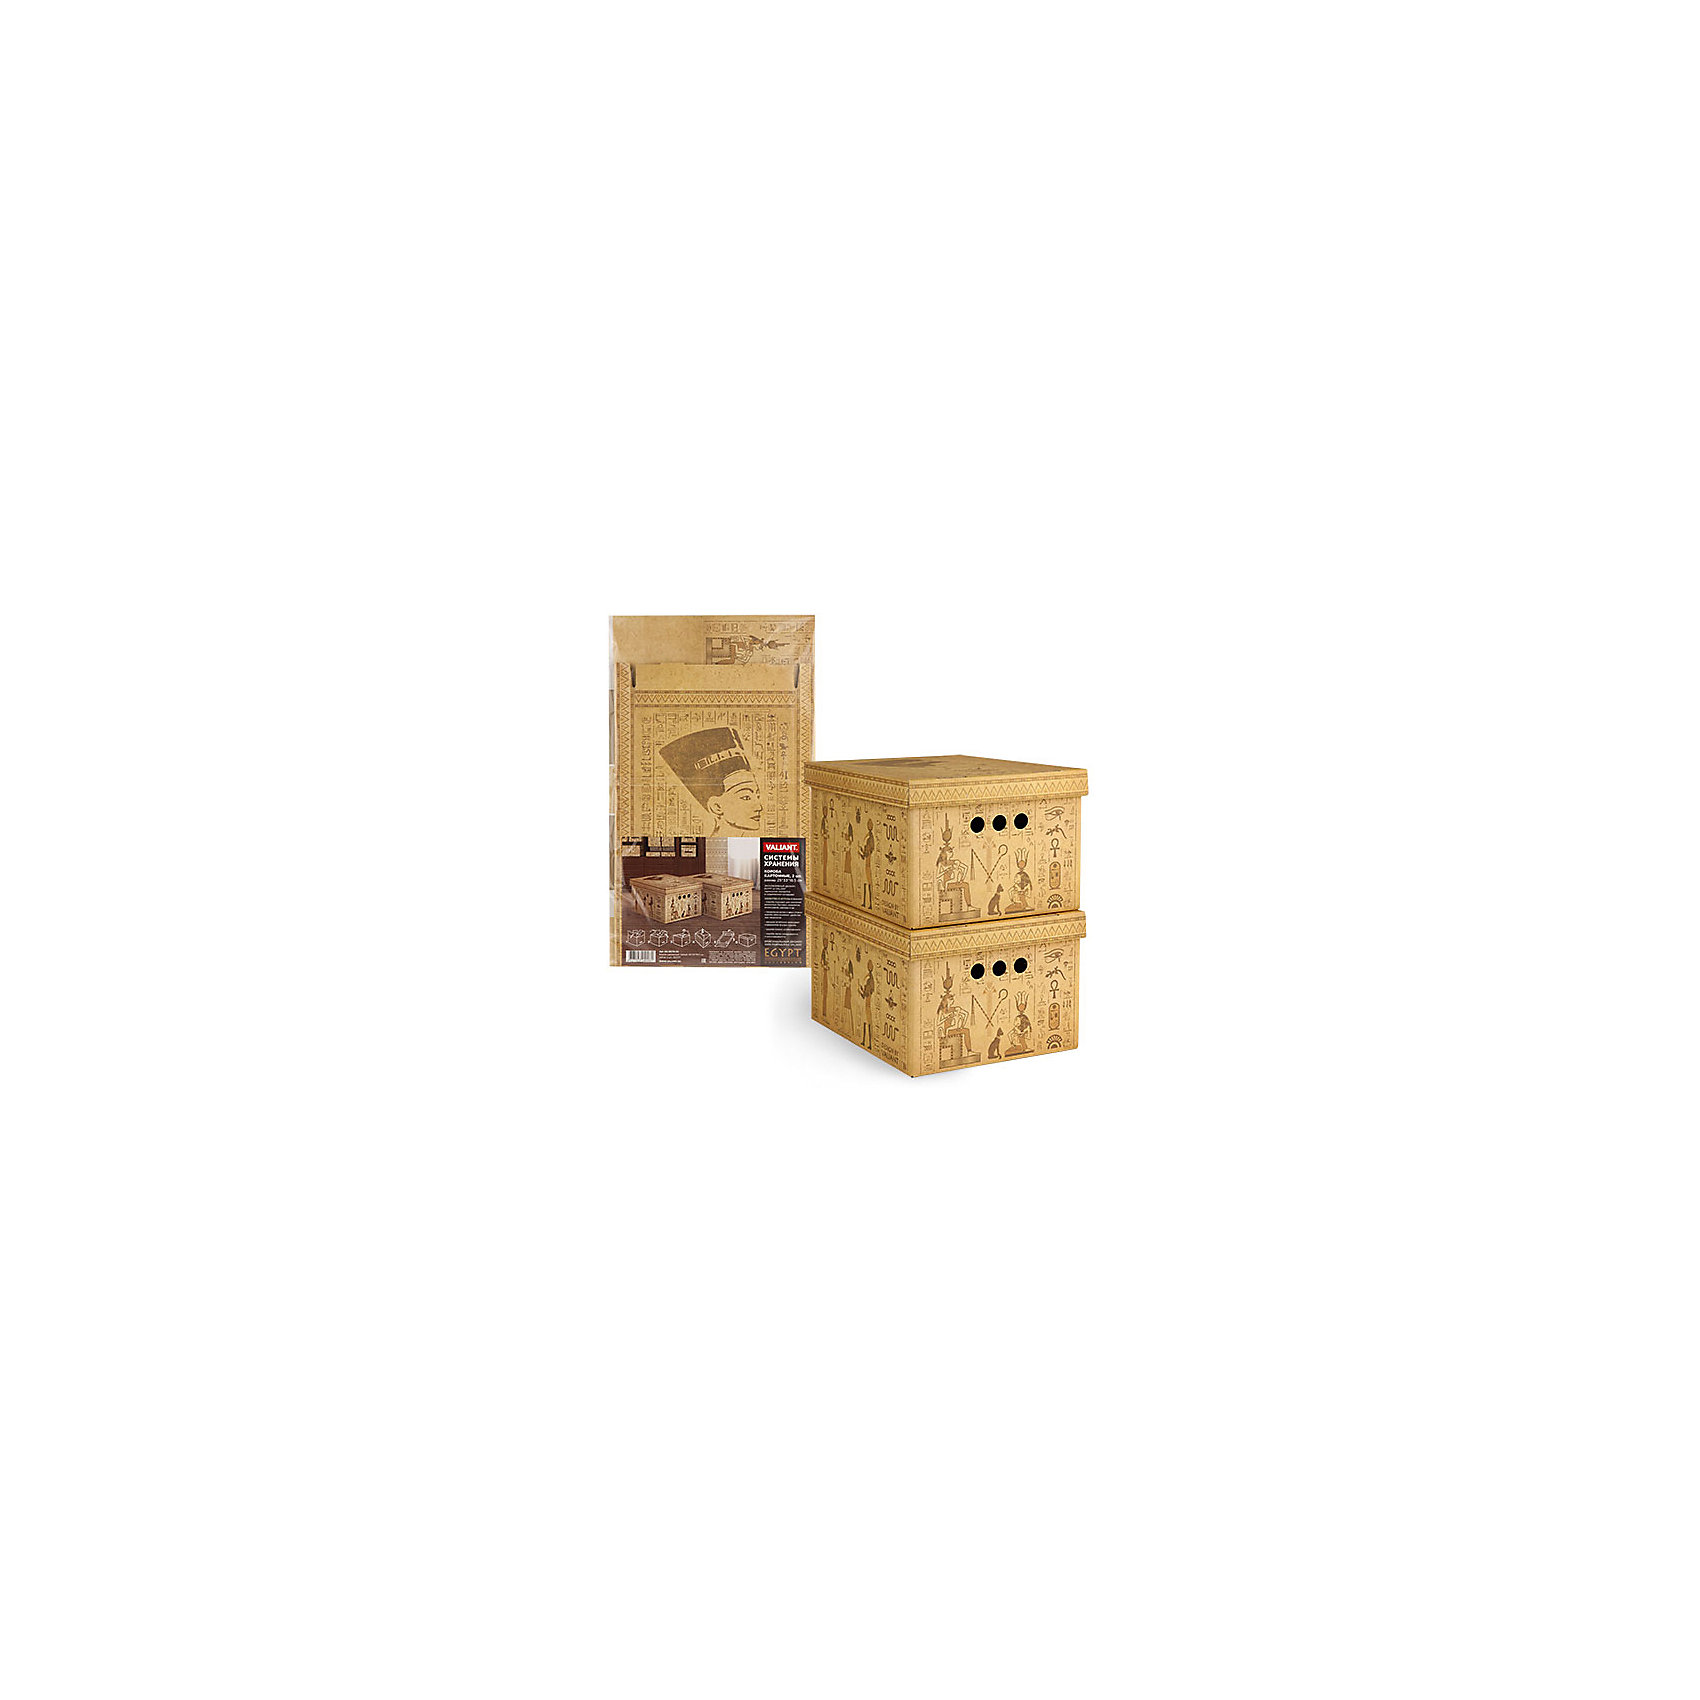 VALIANT Короб картонный, складной, малый, 25*33*18.5 см, 2 шт., EGYPT, Valiant коробки для хранения valiant ящик для хранения egypt 2 шт